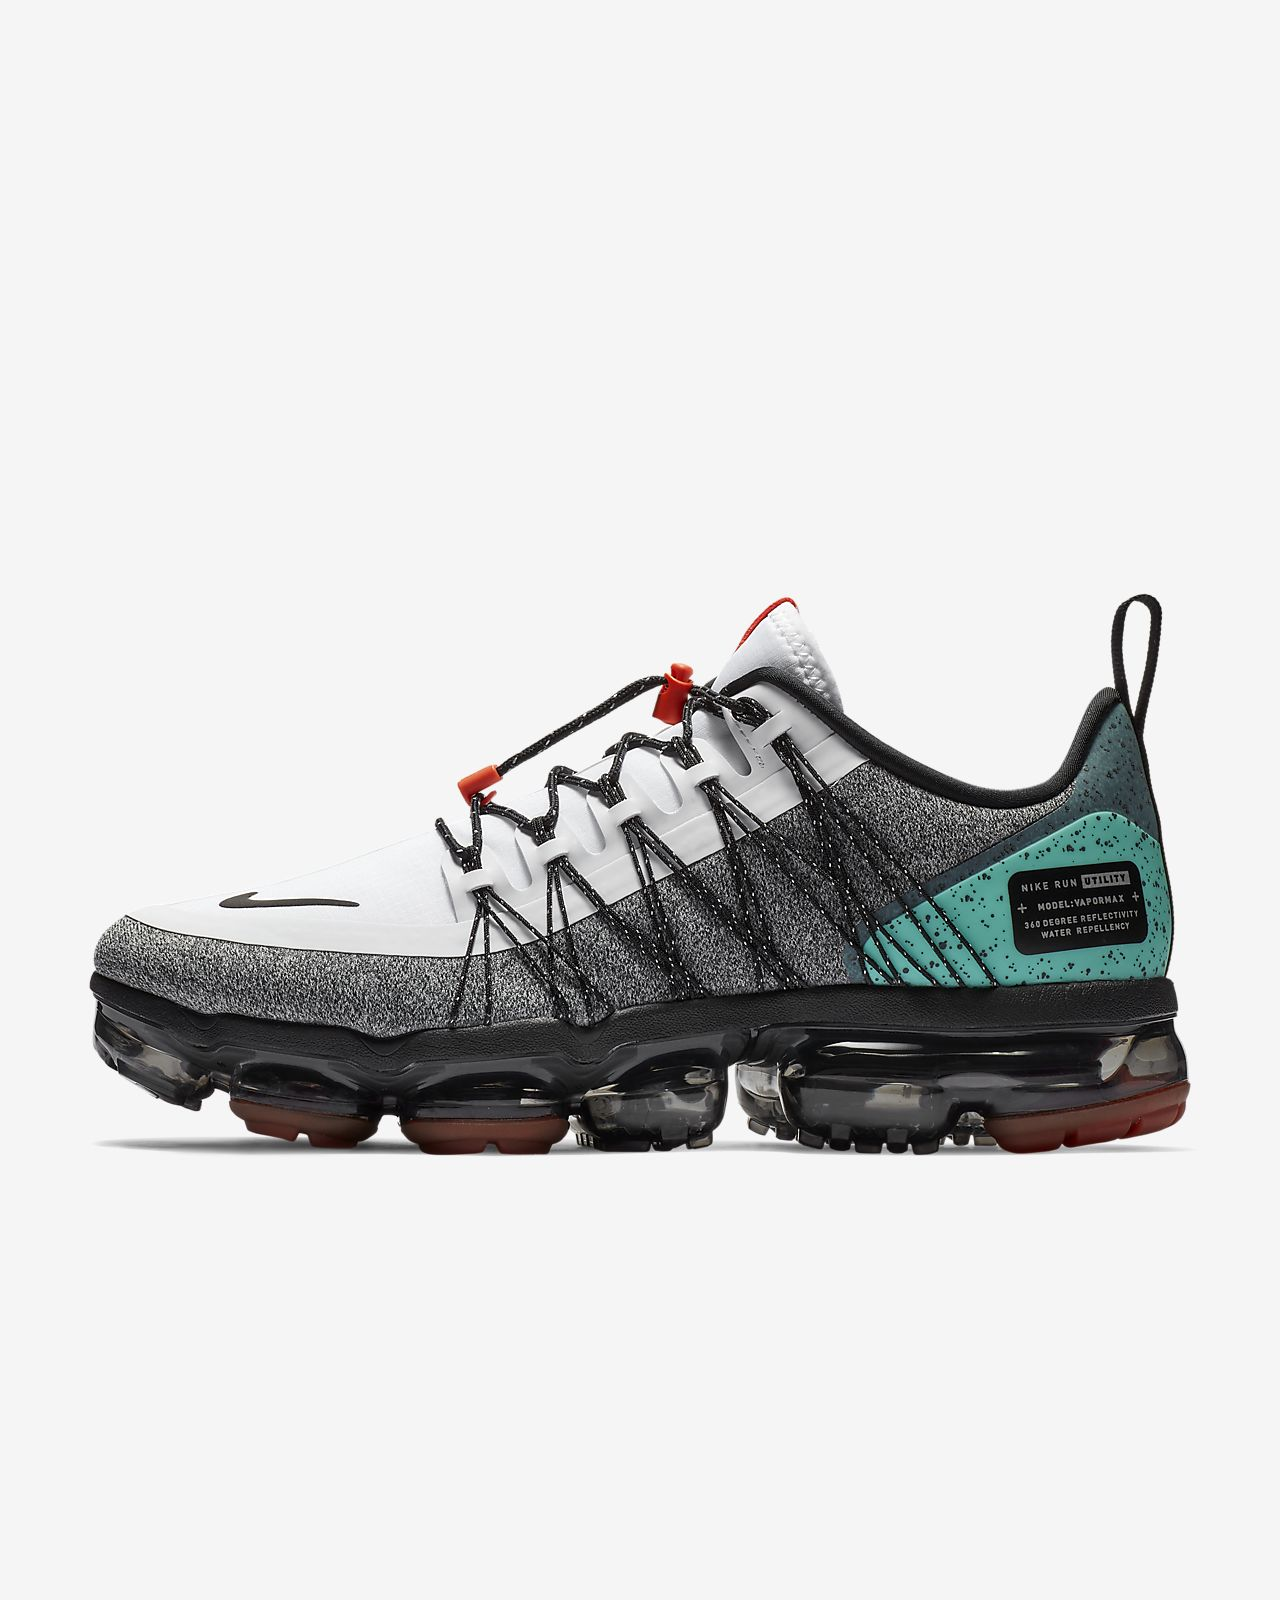 new products 132c0 1b899 ... Nike Air VaporMax Utility-sko til mænd